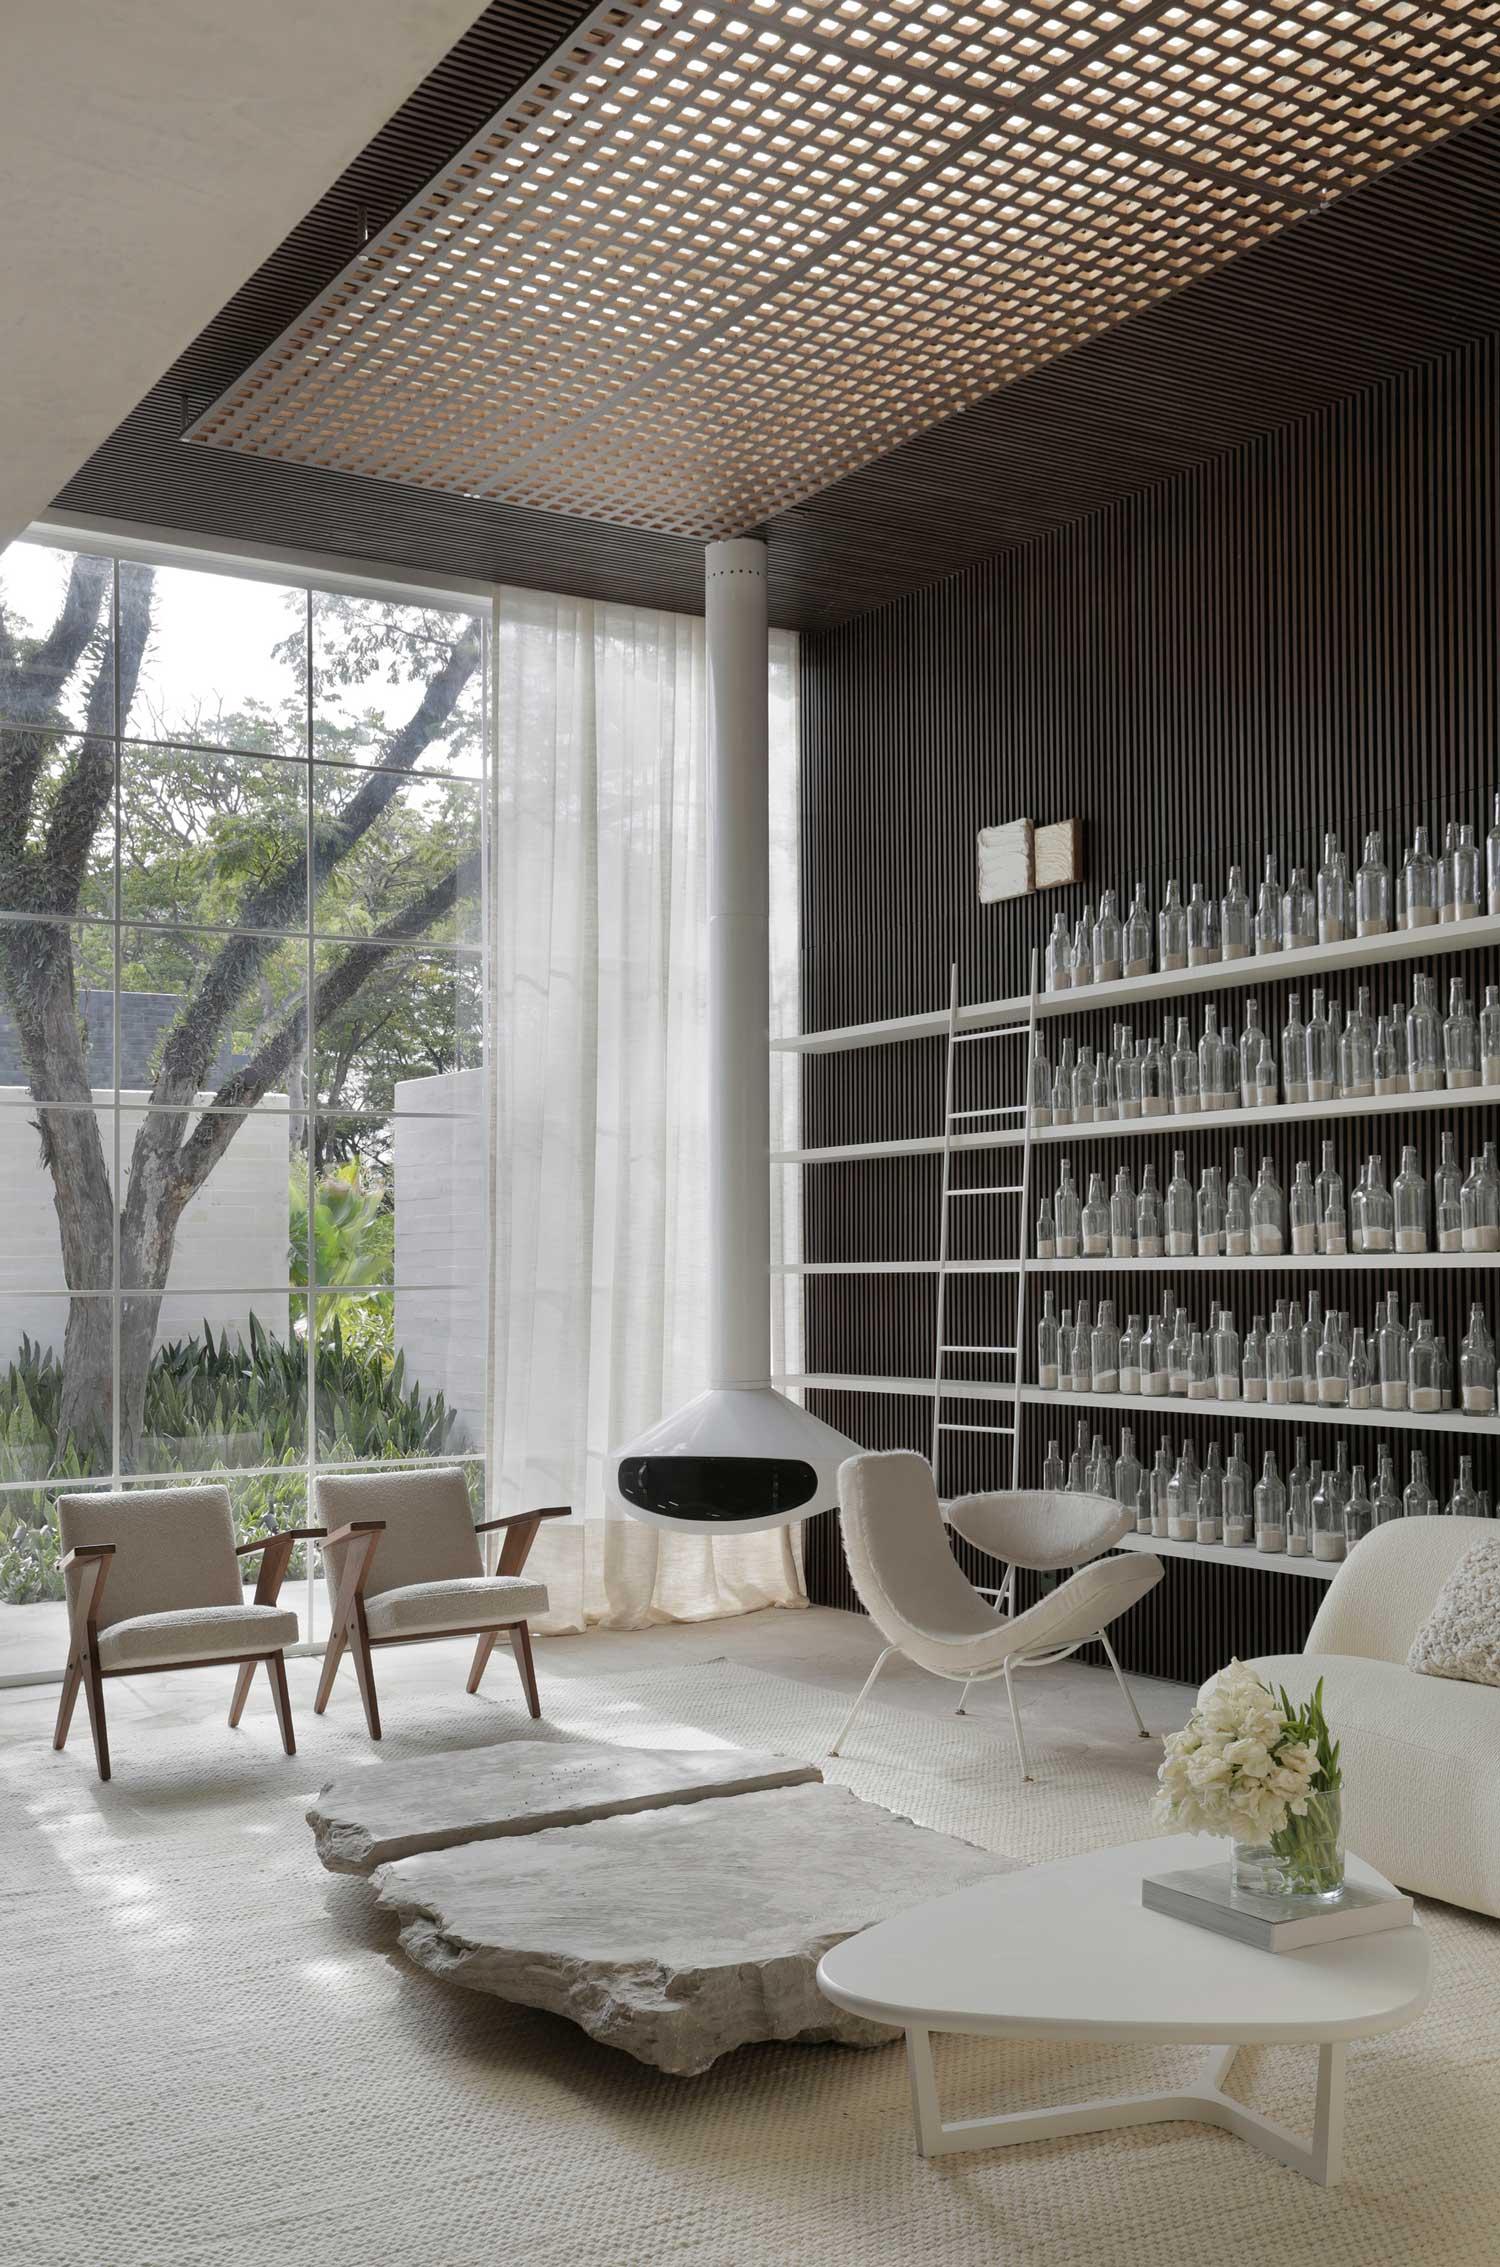 Dendê Duratex Concept House in Cidade Jardim, Brazil by Nildo José | Yellowtrace